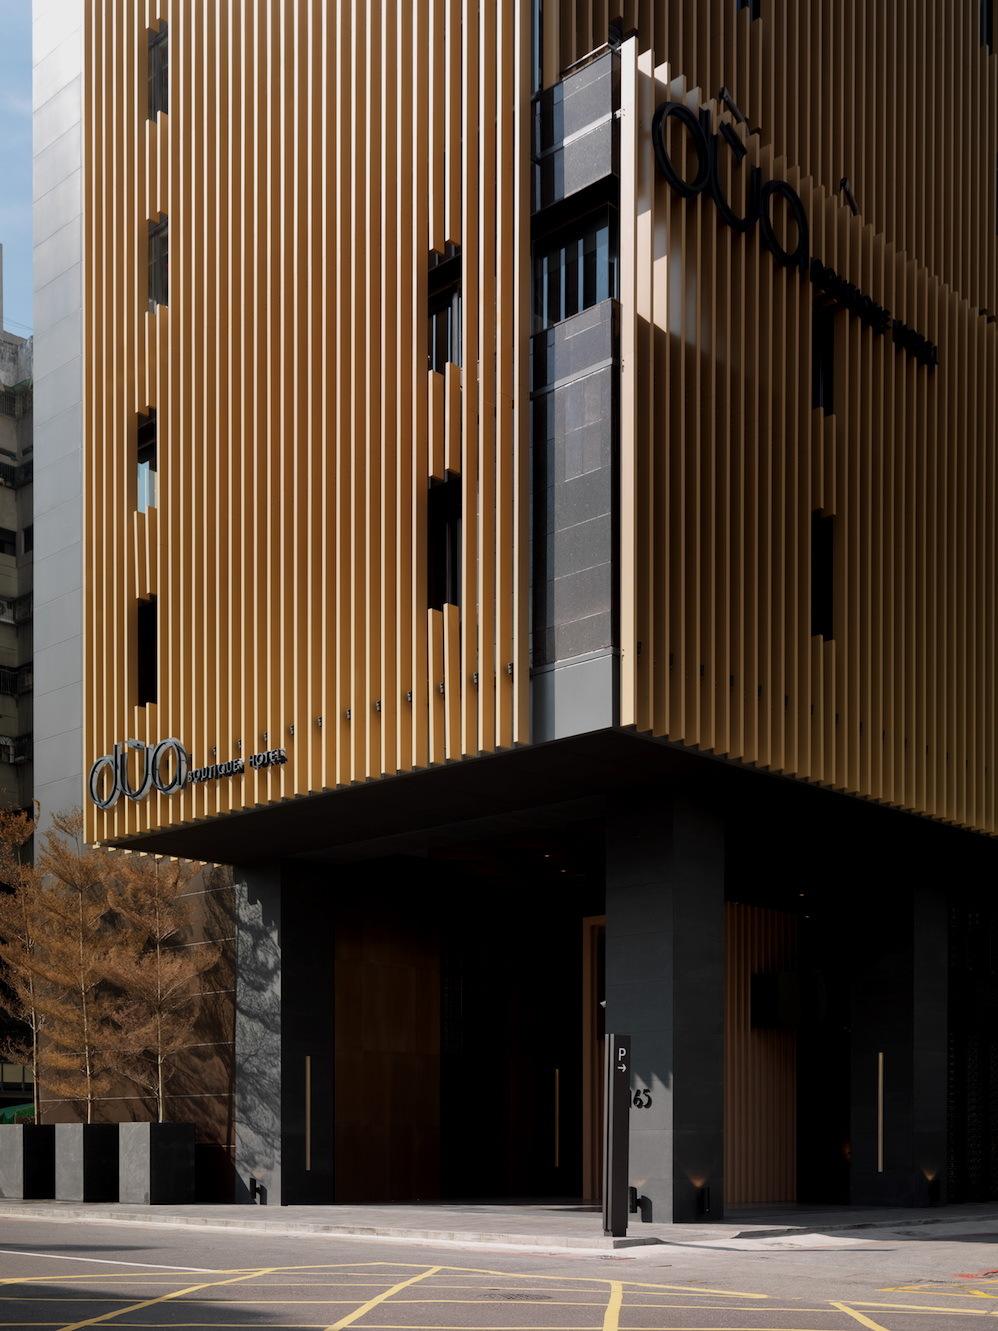 Architecture photography hotel dua koan design 284177 for Hotel design photo